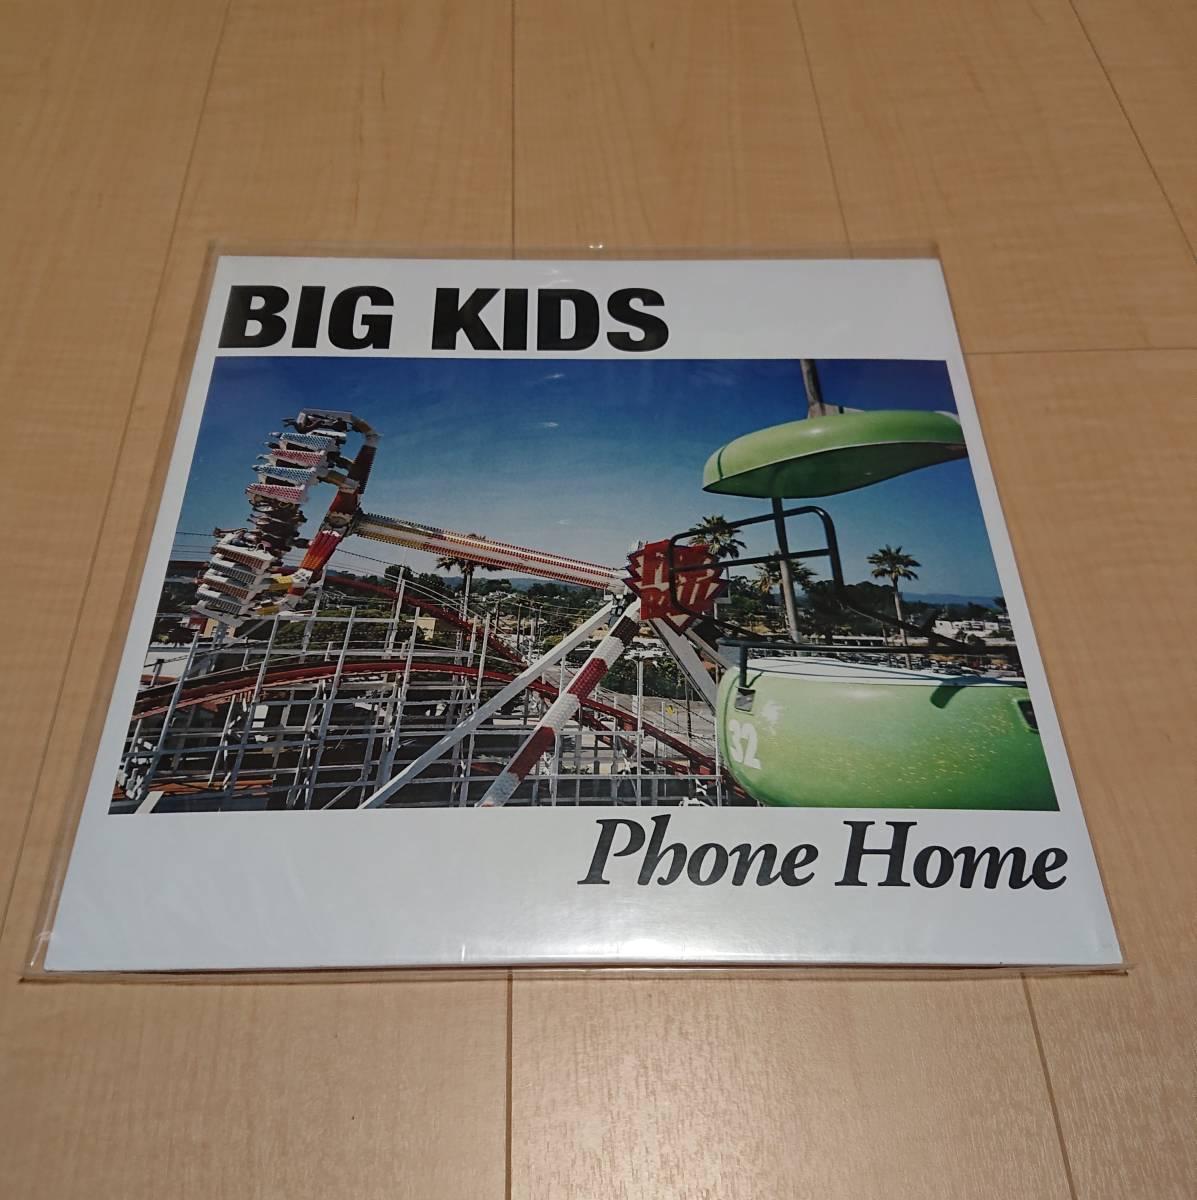 【Big Kids - Phone Home】small brown bike latterman jawbreaker top shelf